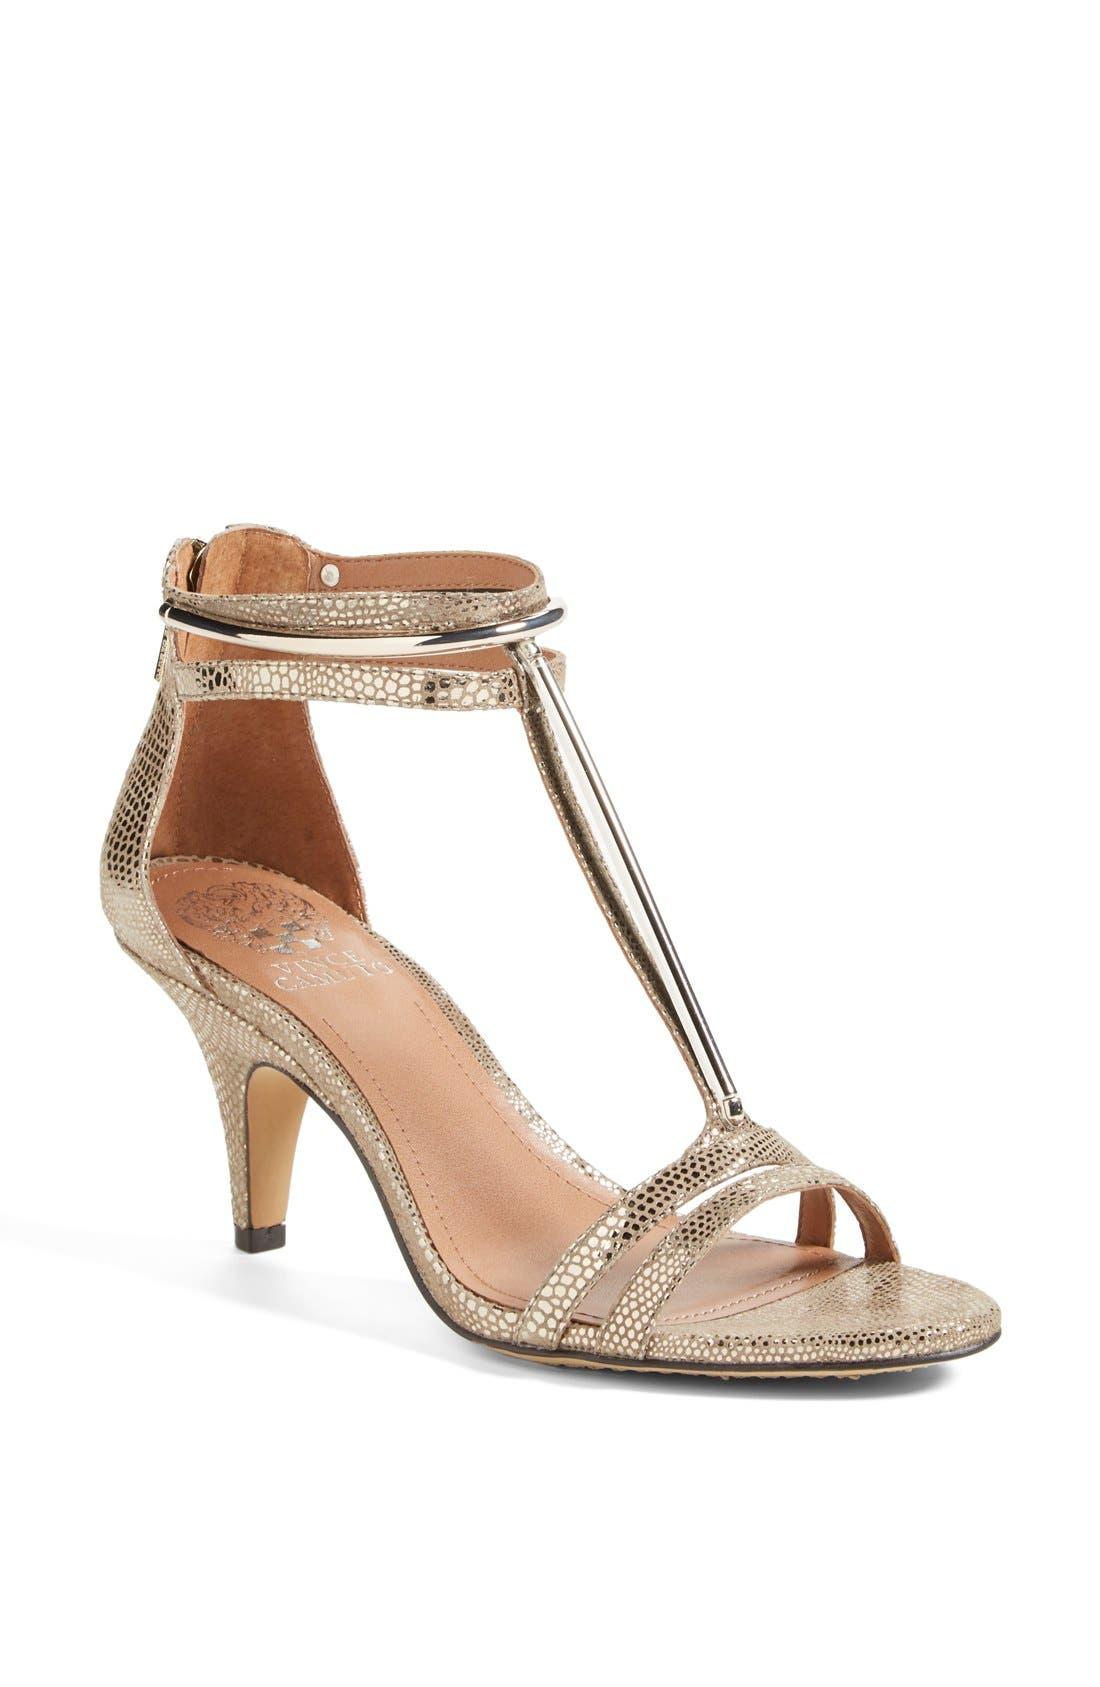 Main Image - Vince Camuto 'Mitzy' Metallic T-Strap Sandal (Women)